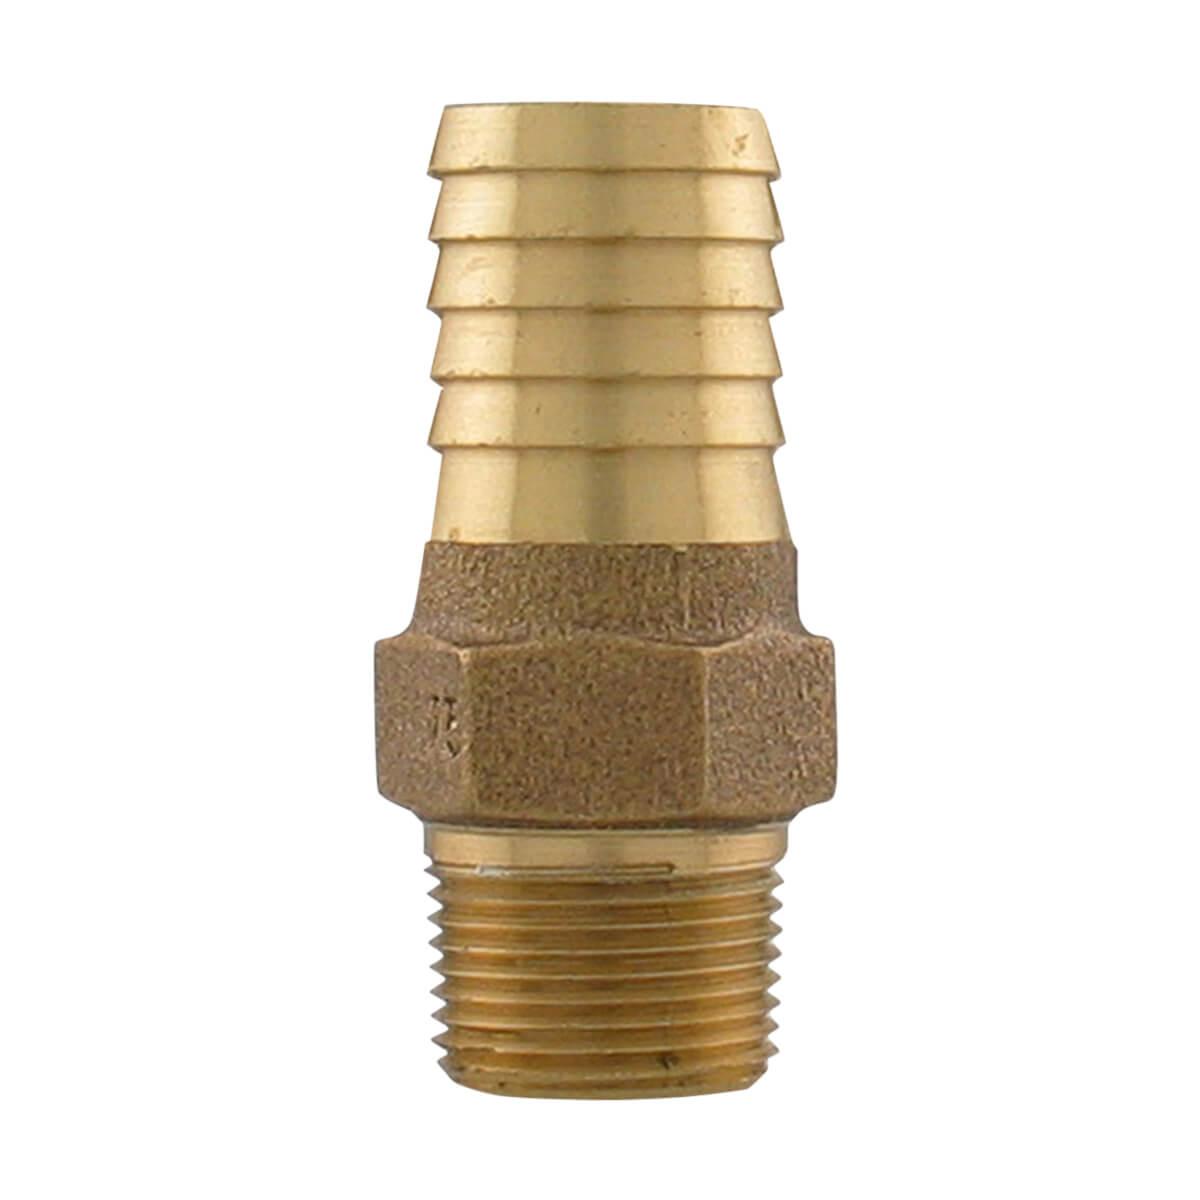 "Bronze Male Adapter - 3/4"" MIP x 1"" INS"